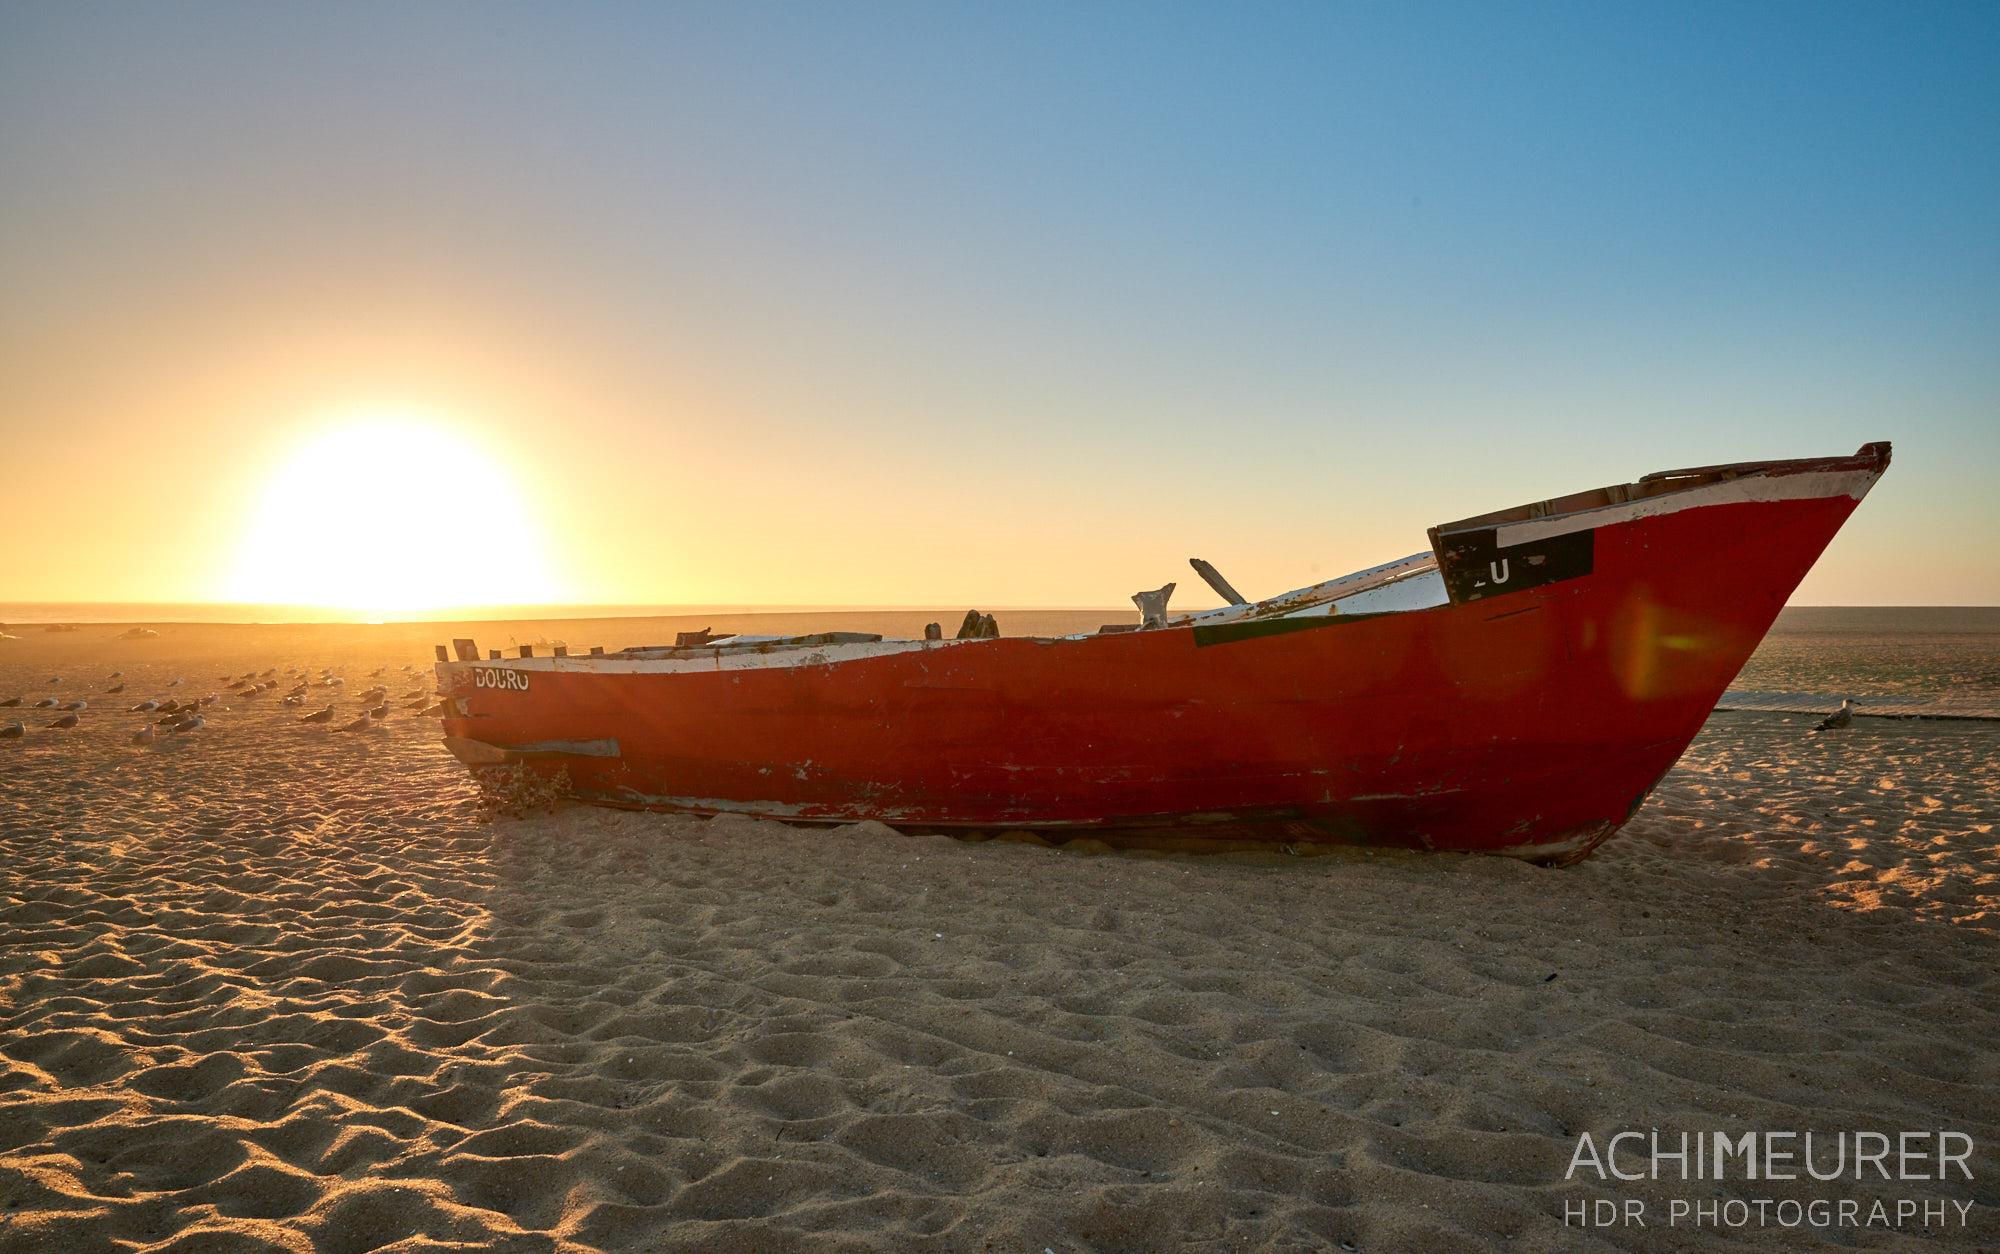 Sonnenuntergang am Strand in Aguda in der Nähe von Porto in Portugal by Array.